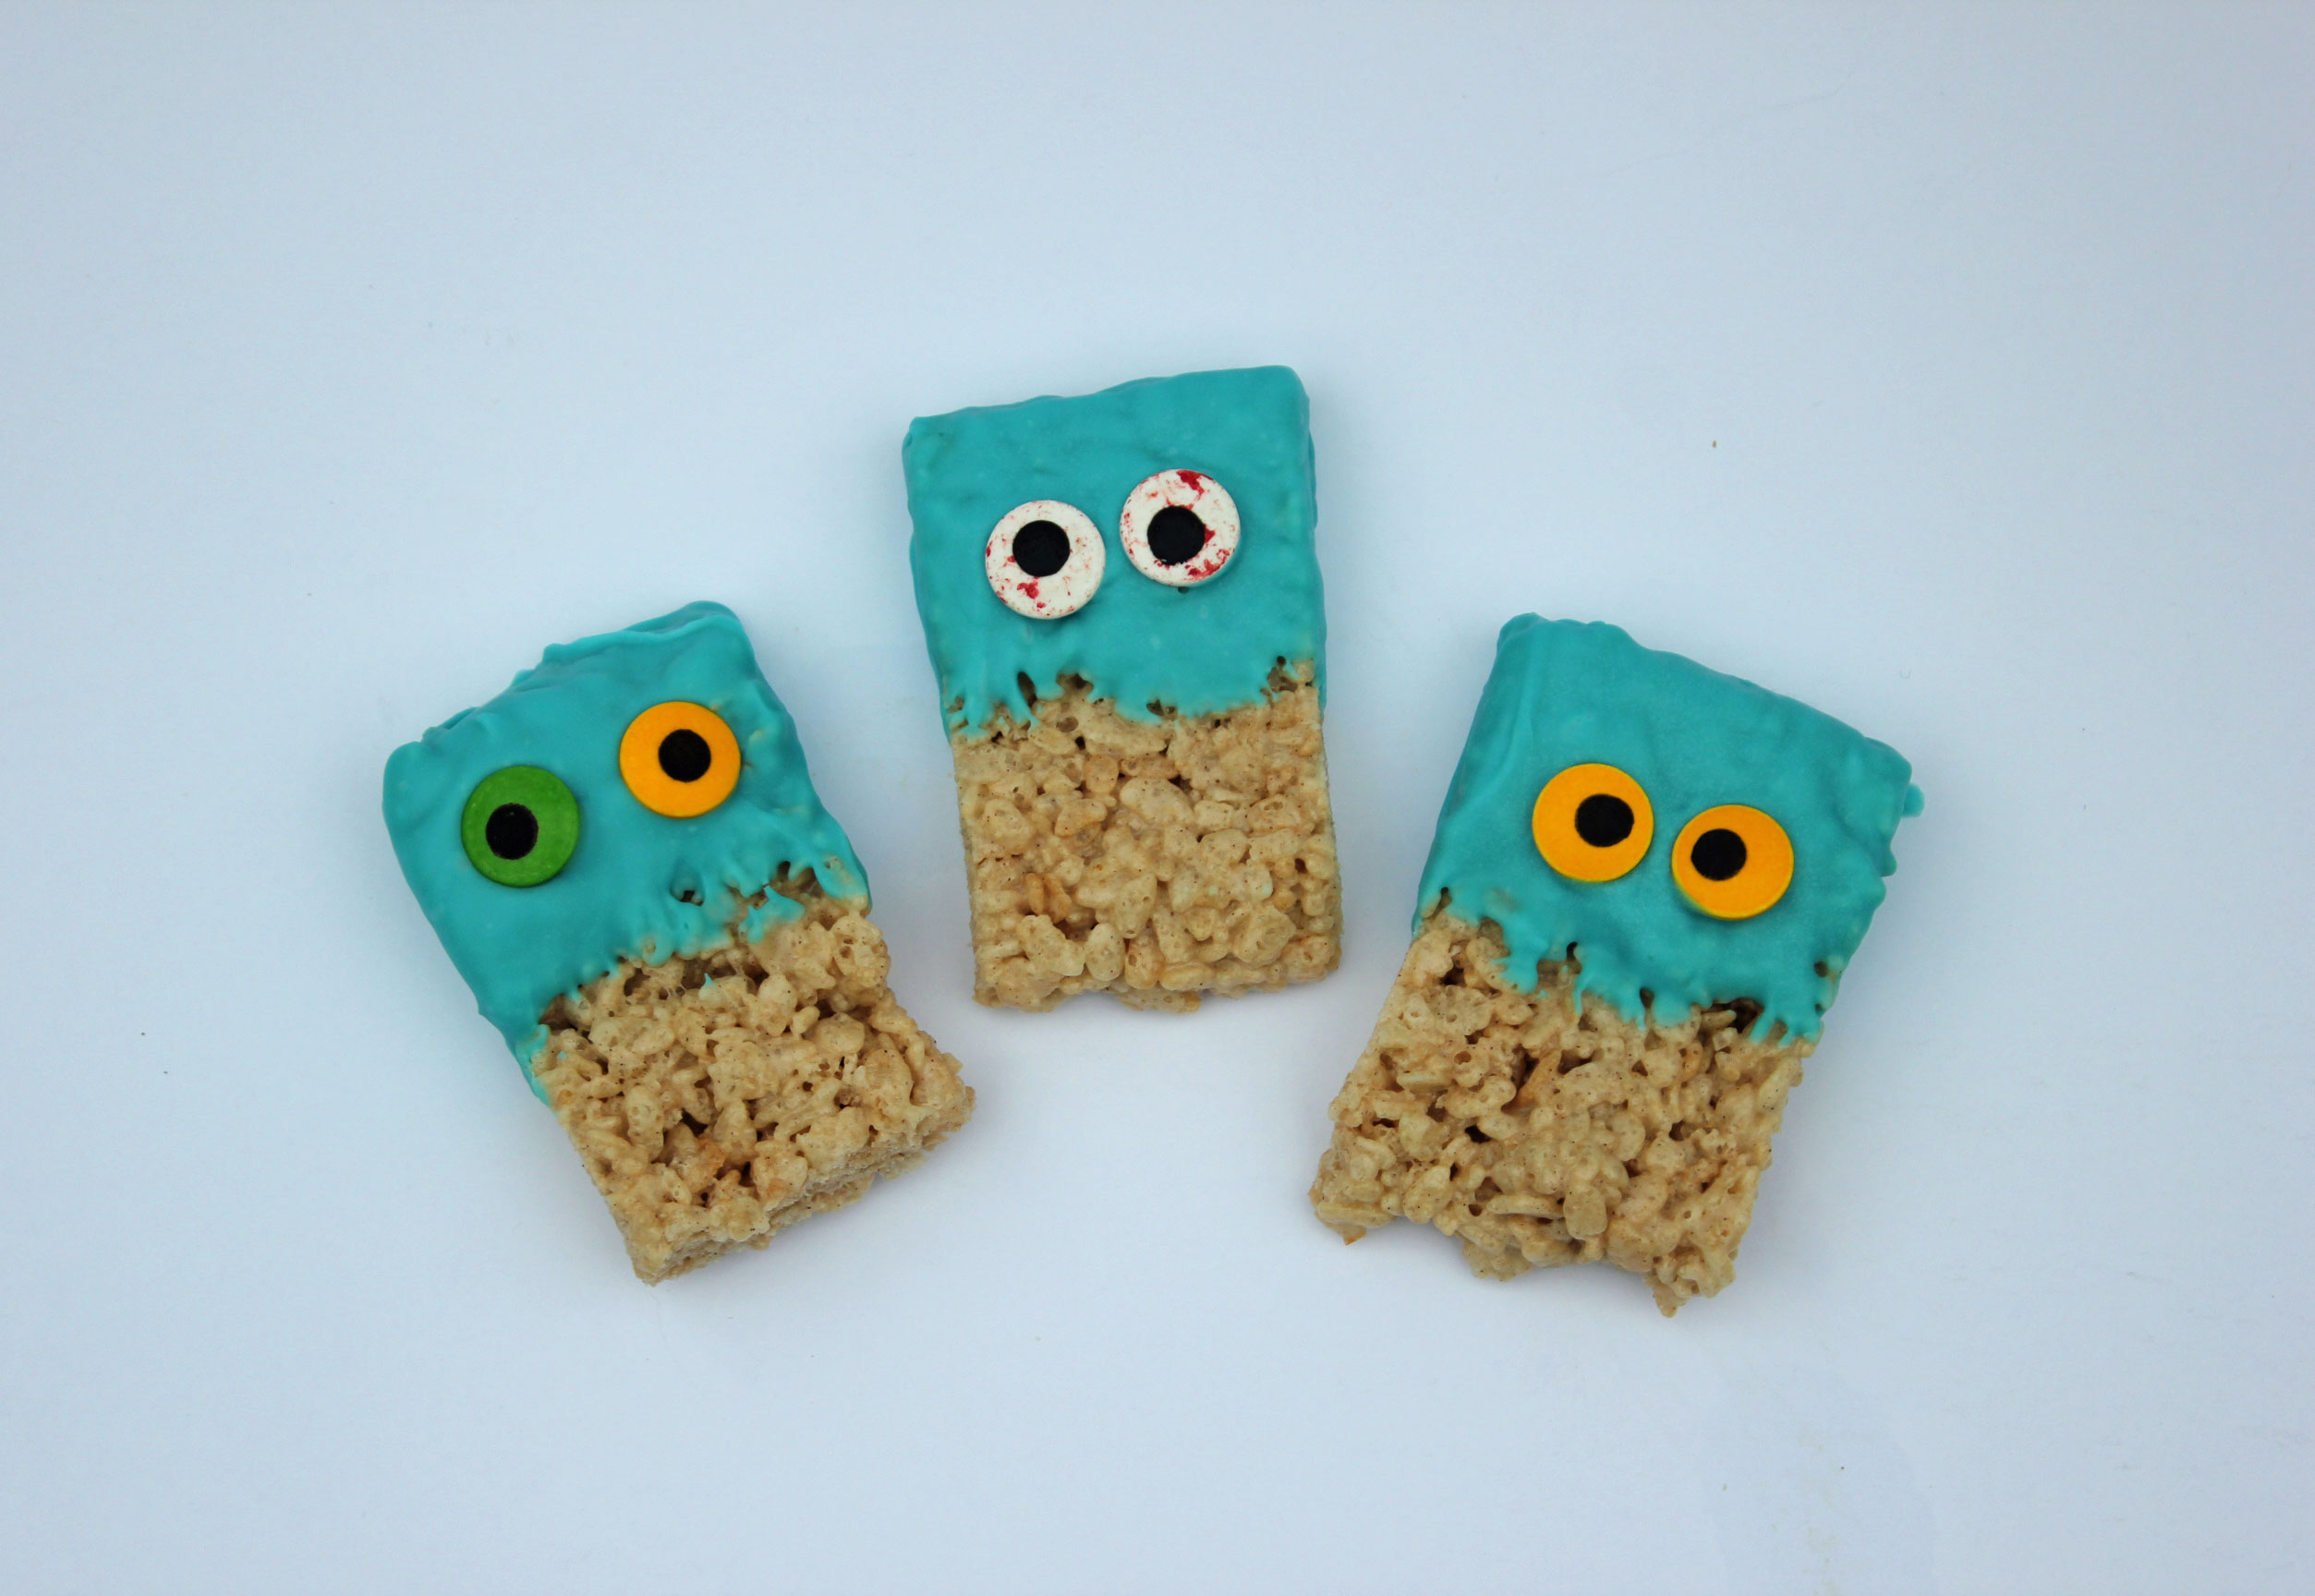 Googly Eyed Rice Krispies